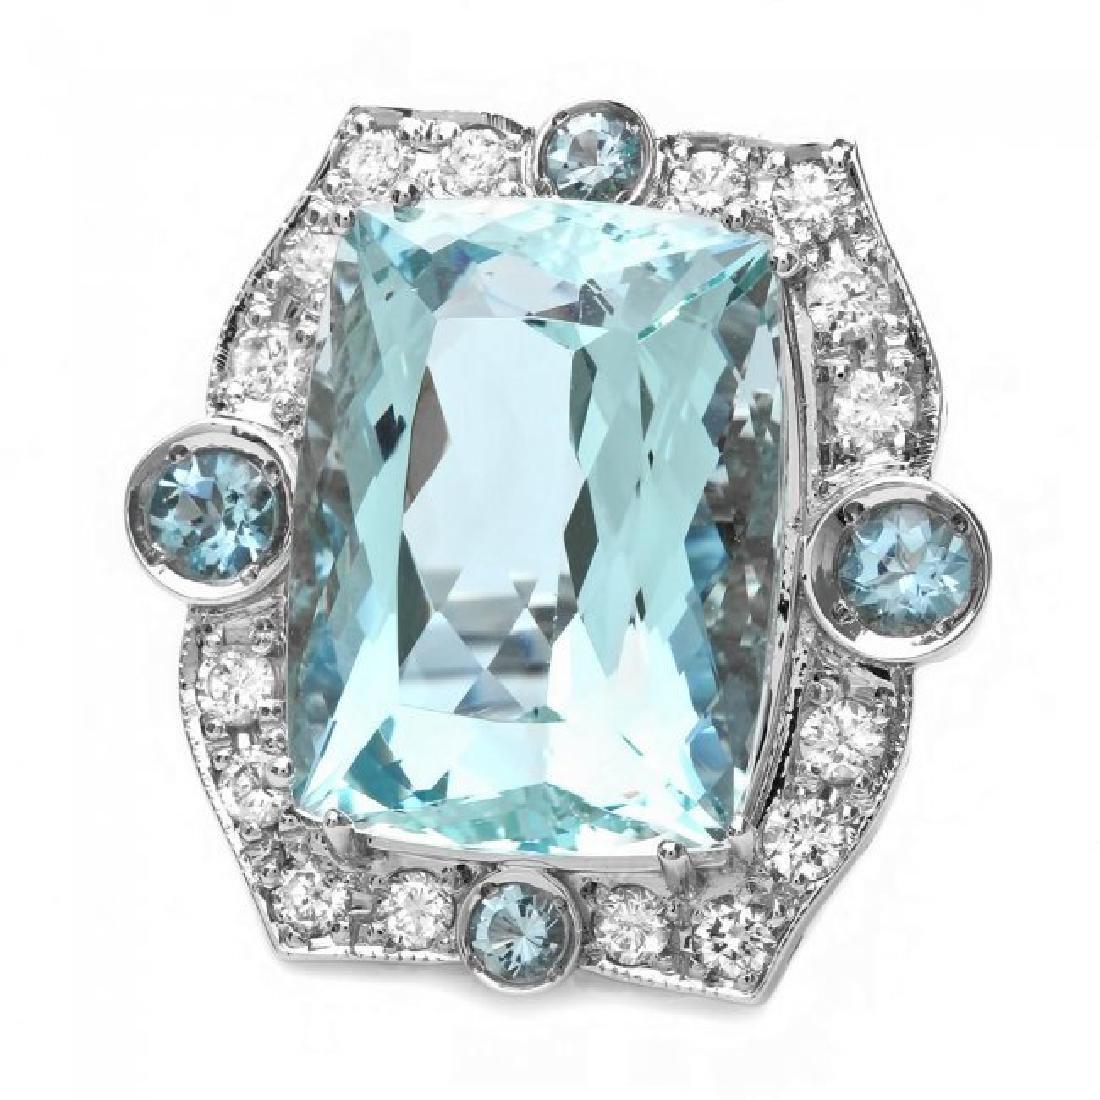 14k Gold 22ct Aquamarine 1.35ct Diamond Ring - 2